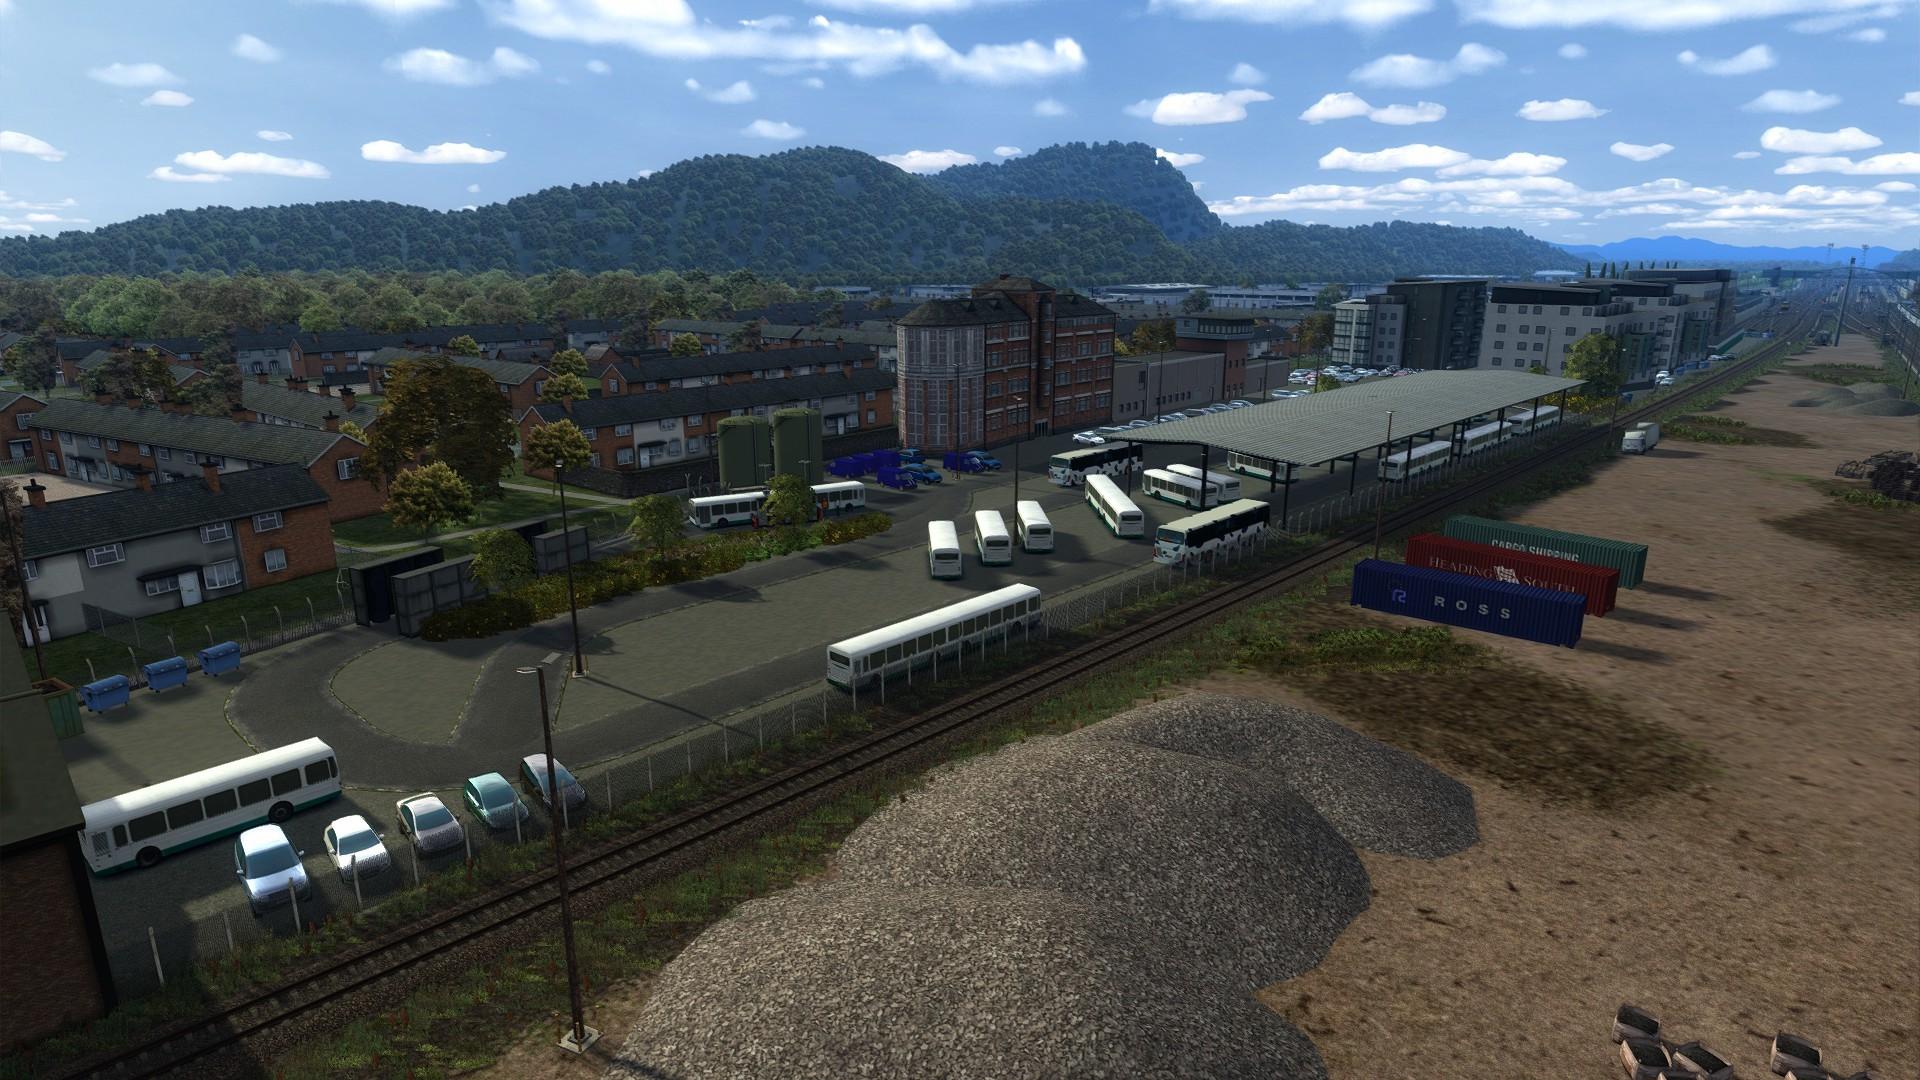 The bus depot of Serinathea